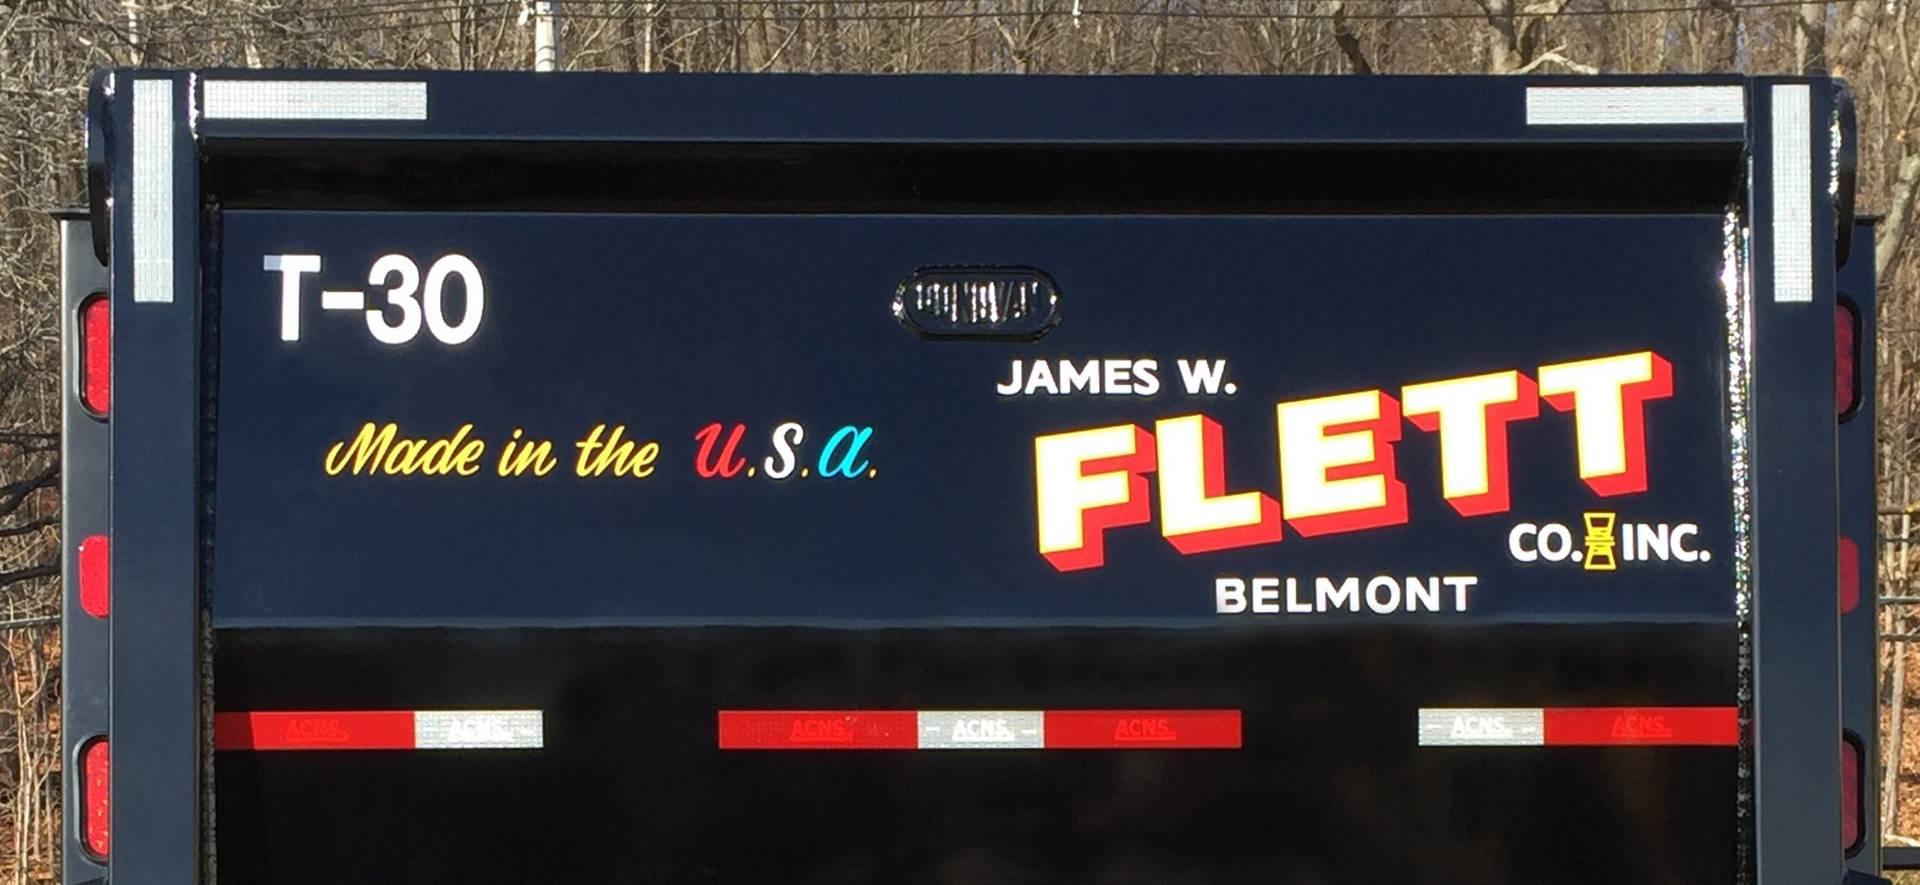 James W Fleet Co. Inc